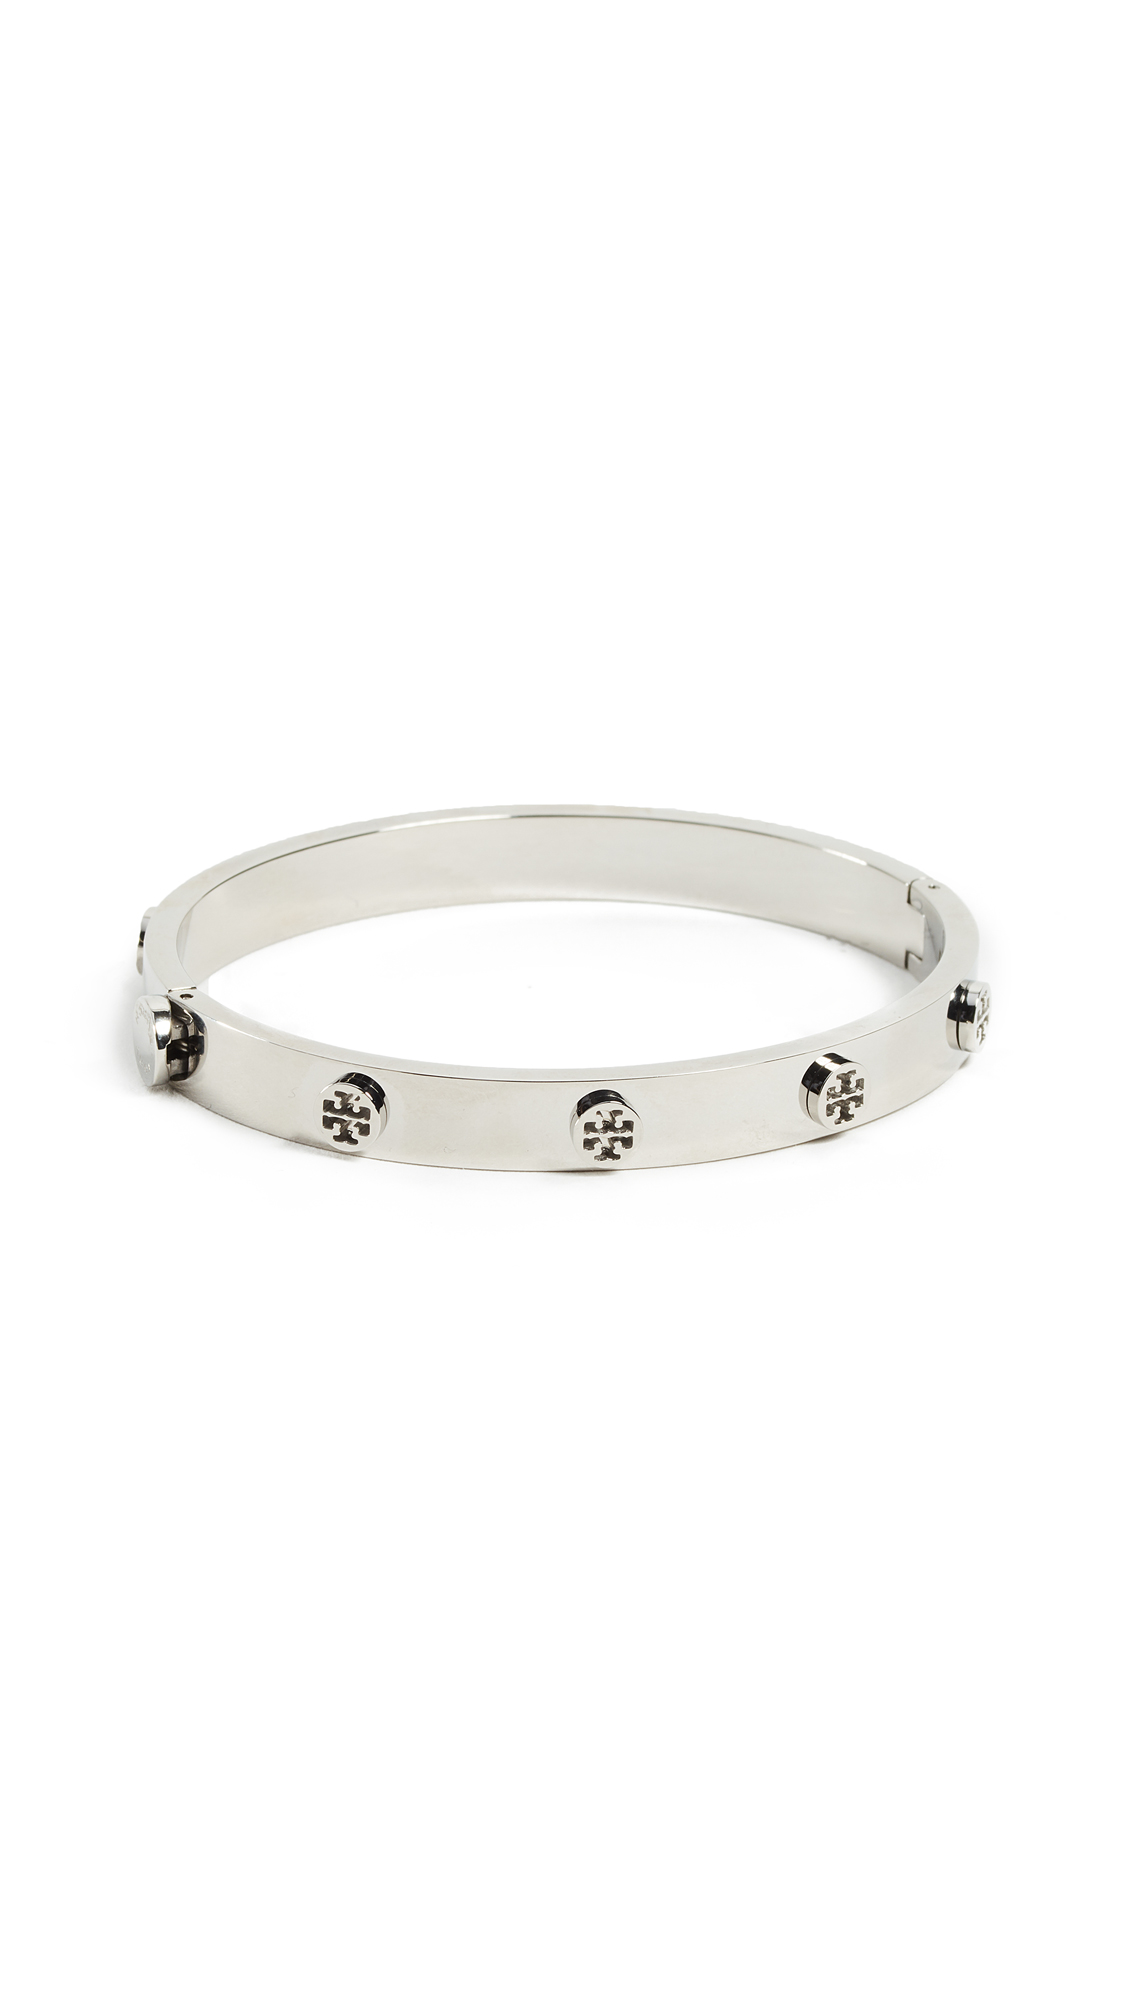 Tory Burch Logo Stud Hinge Bracelet - Tory Silver